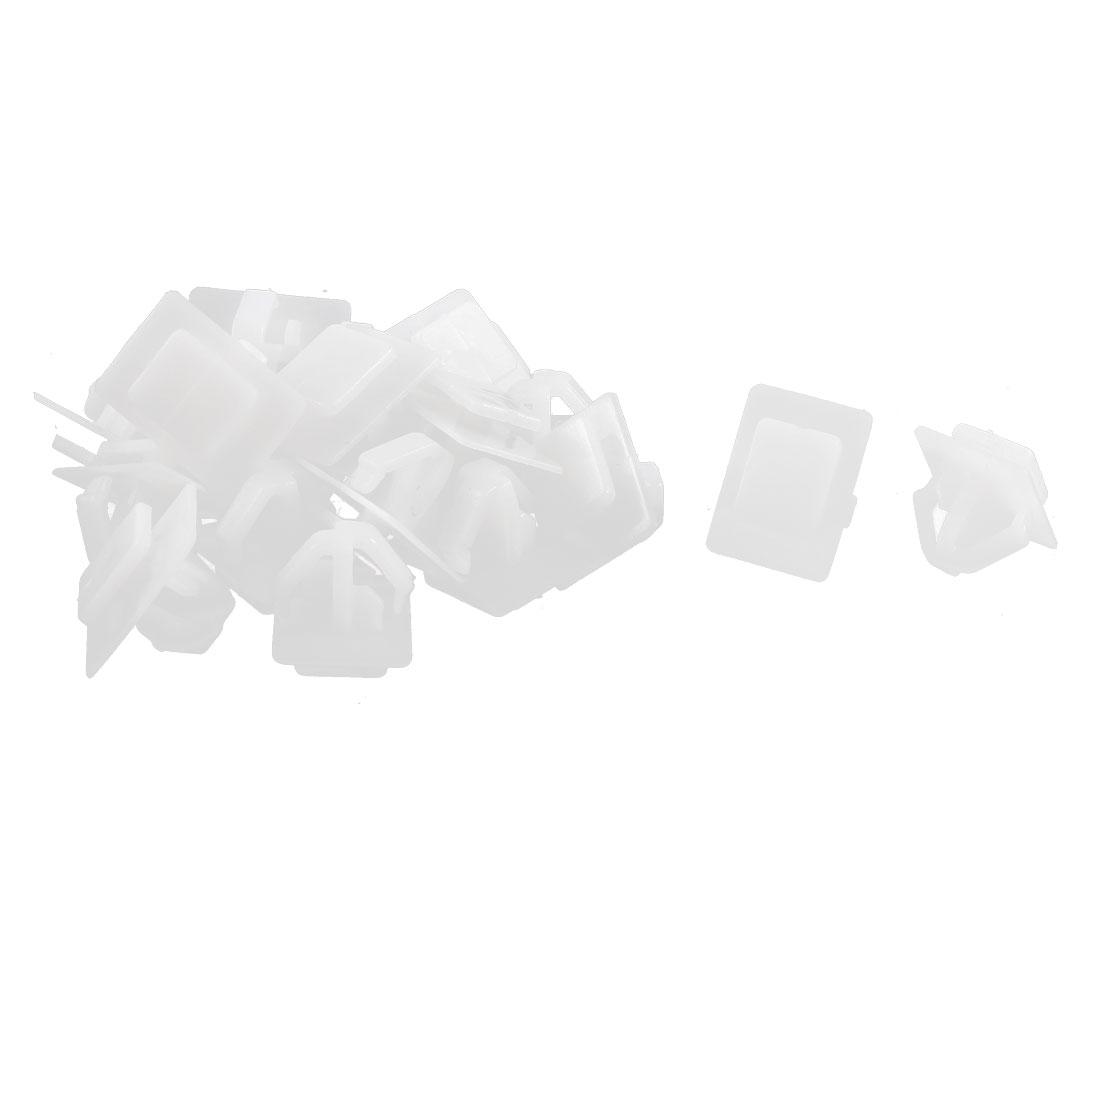 20 Pcs White Plastic Push-Type Moulding Rivet Clips 10mm Stem Length